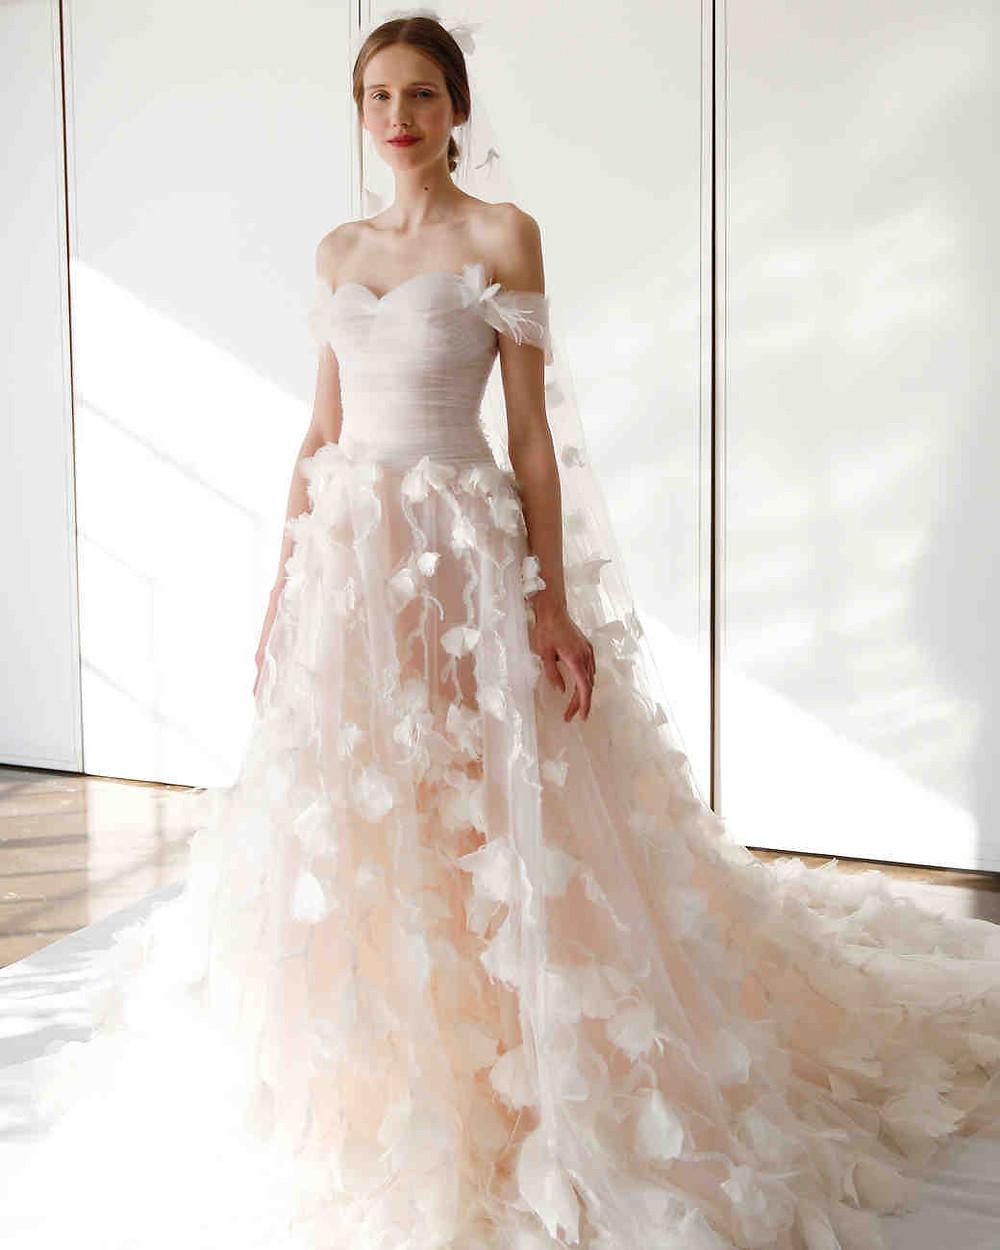 Marchesa, Bridal SS17, New York City, April 13 2016